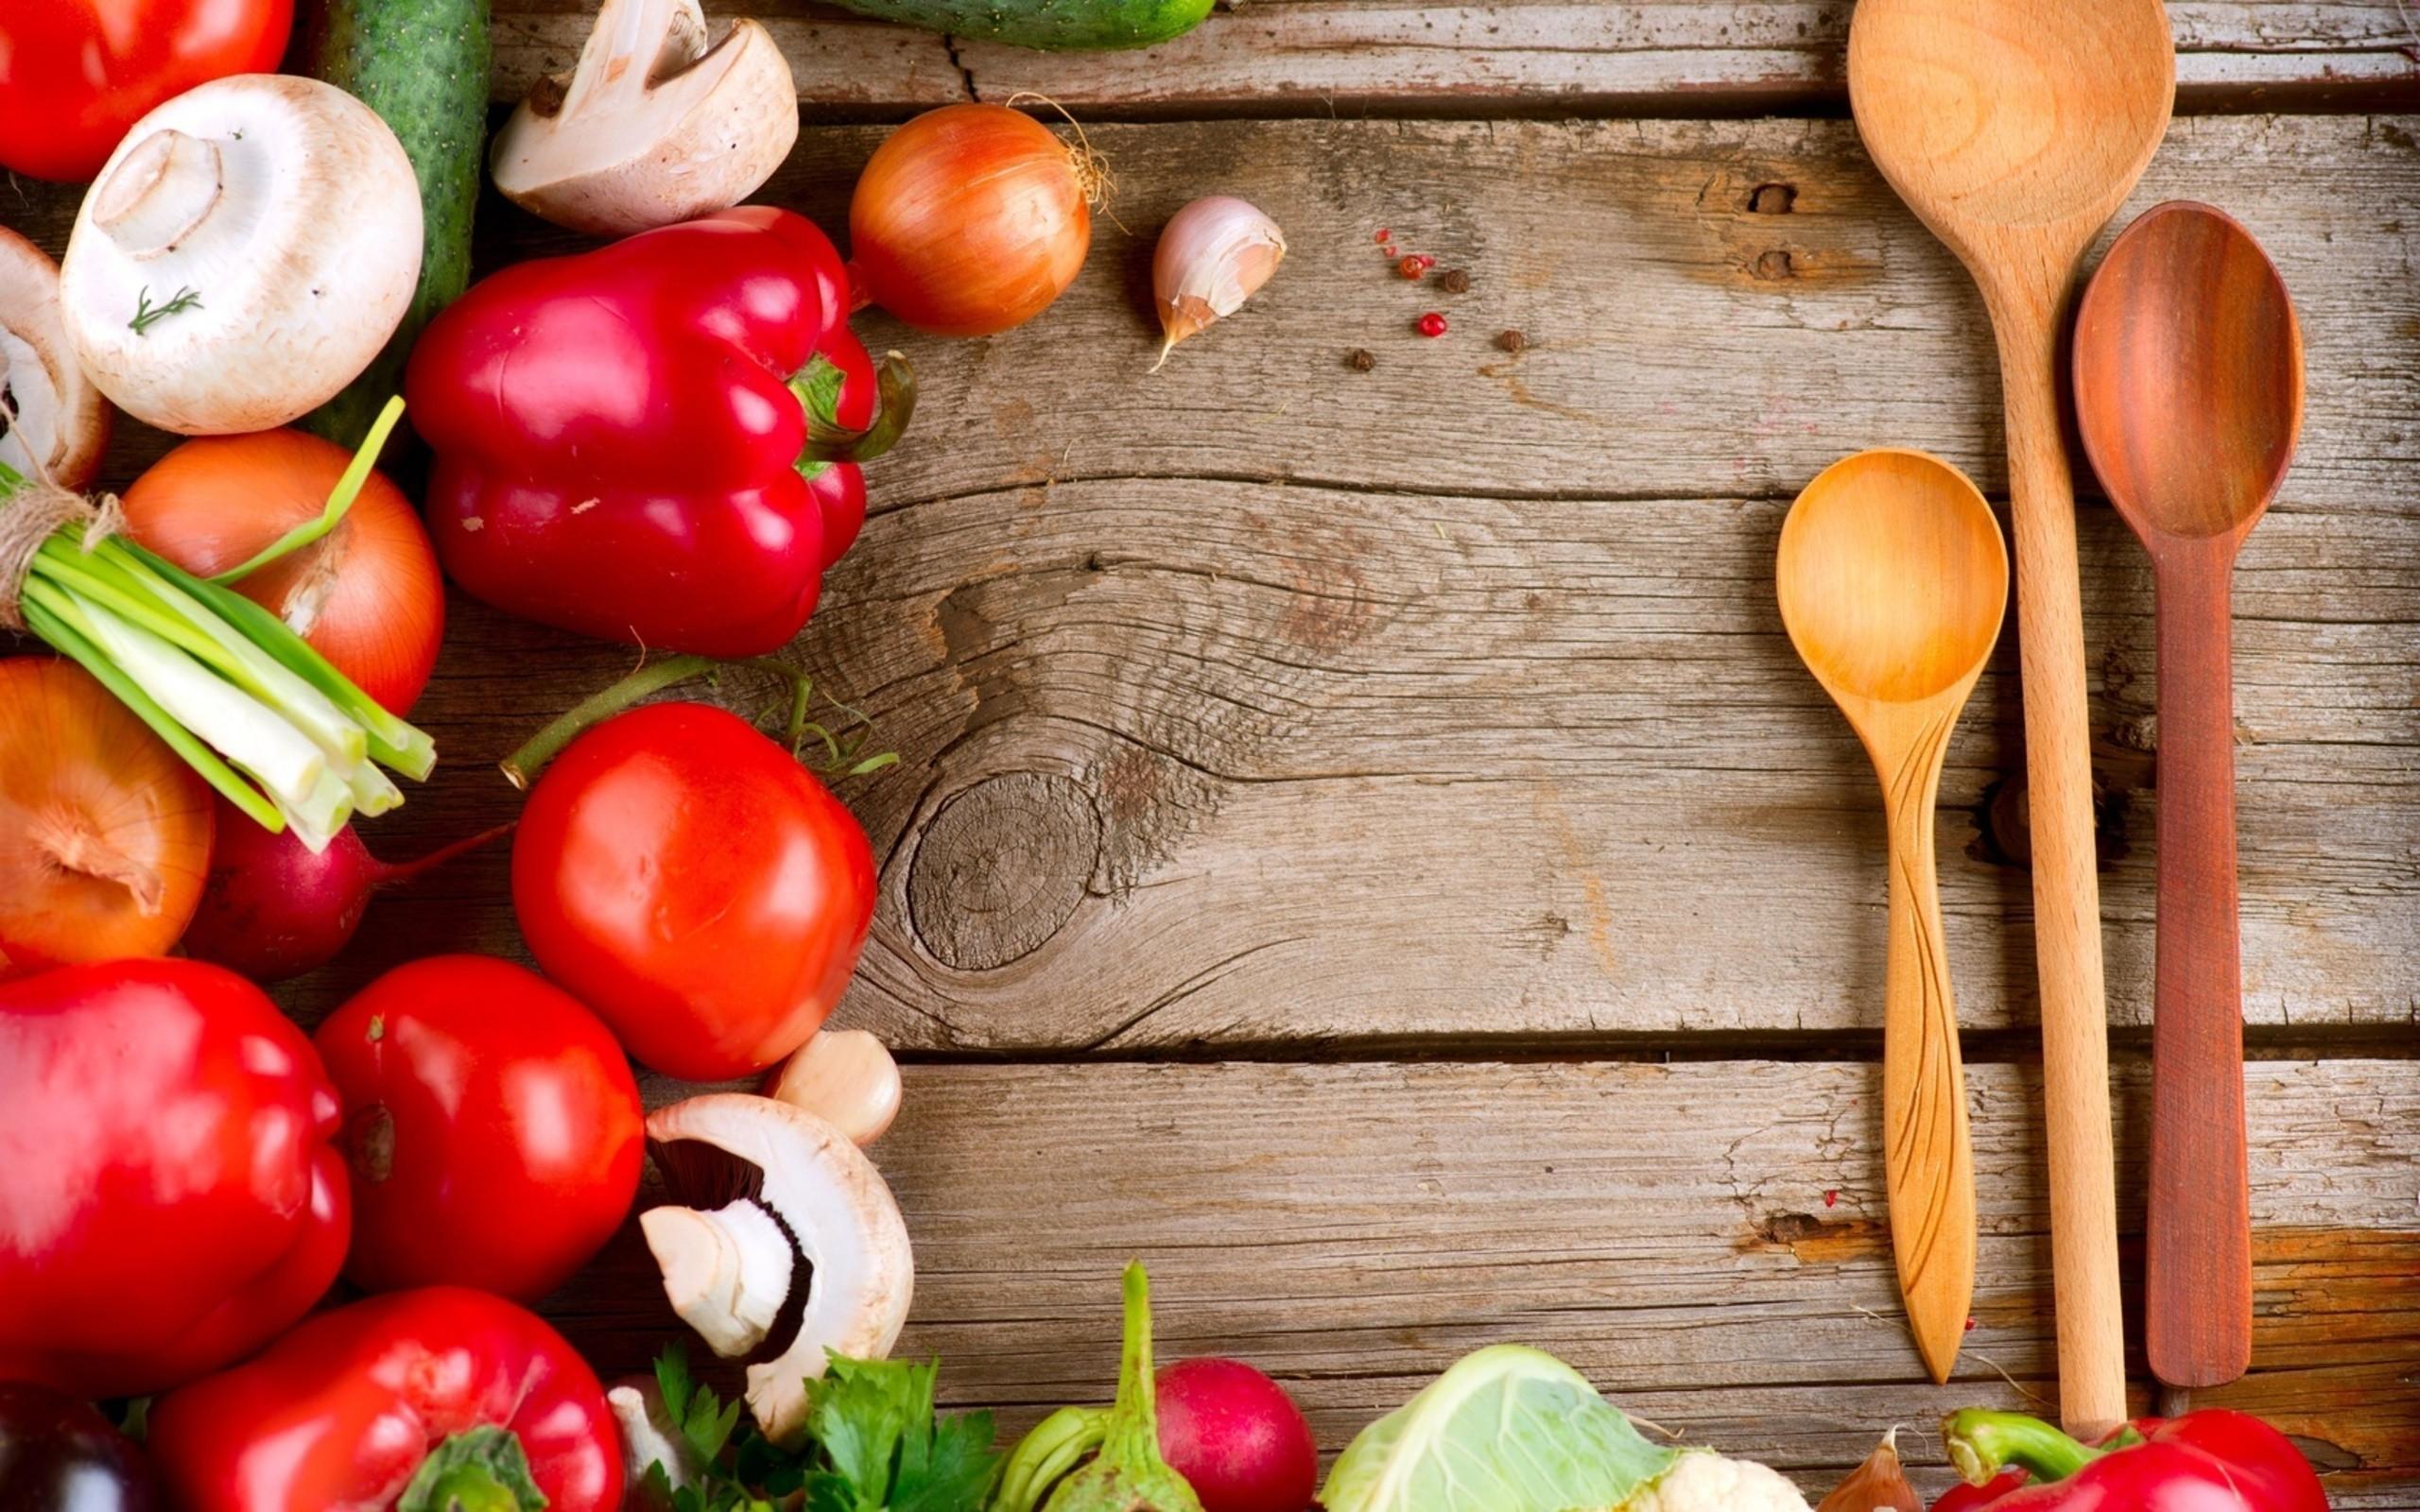 Food-wallpaper-14.jpg